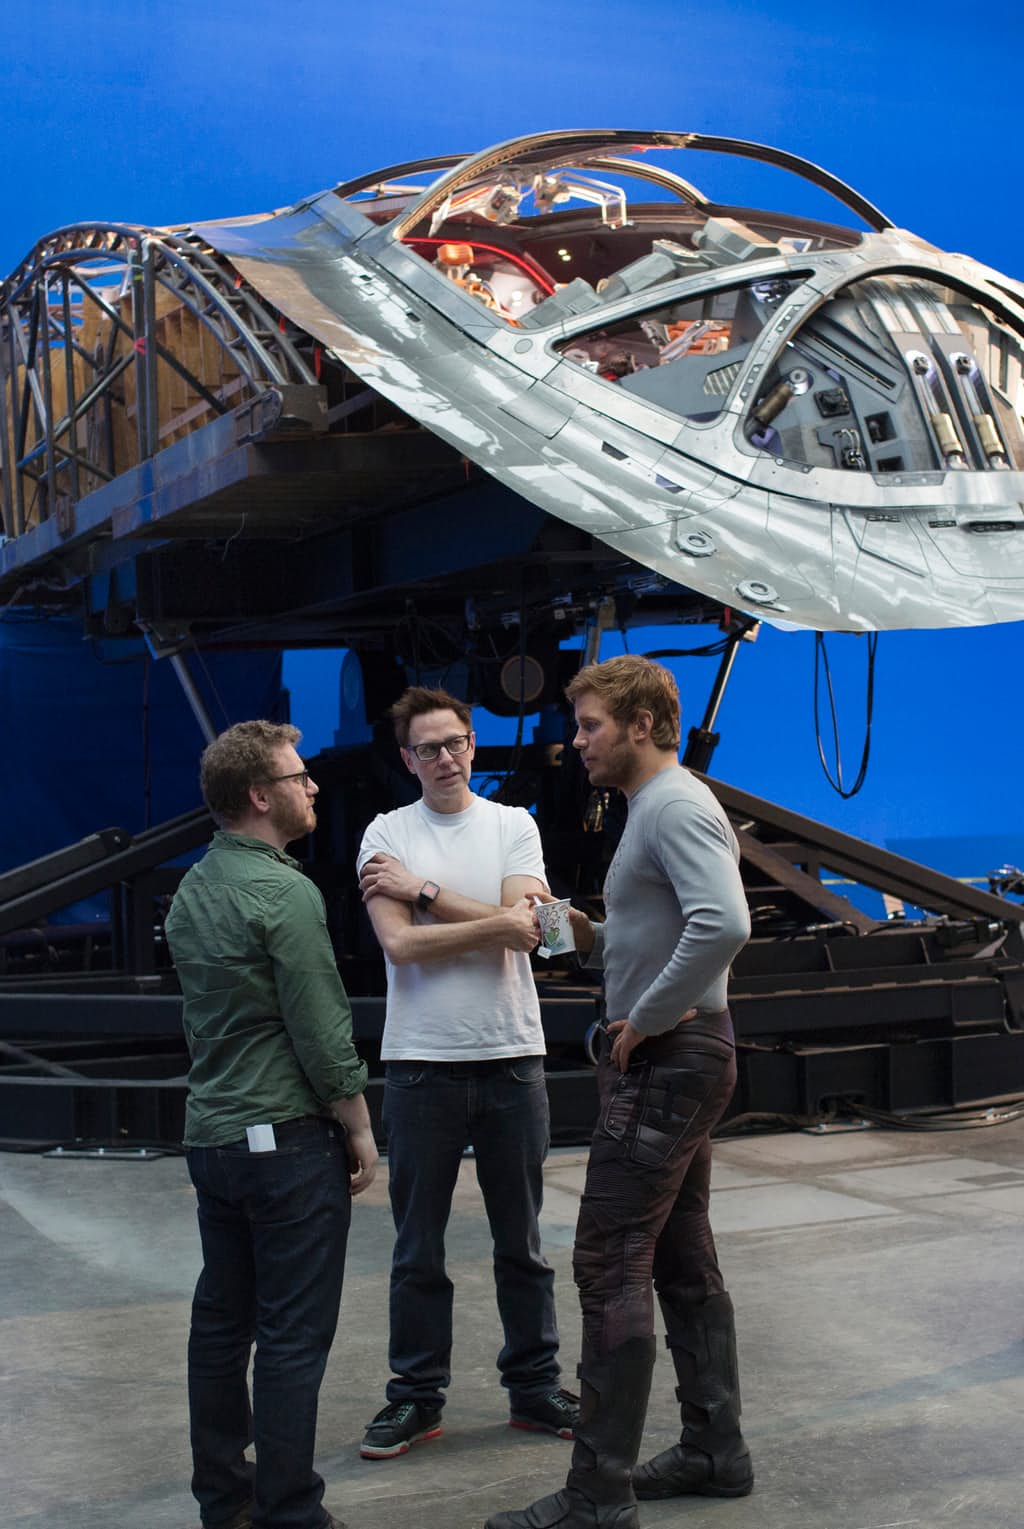 Guardians-of-the-Galaxy-2-BTS-Set-Photo-Milano-Chris-Pratt-James-Gunn